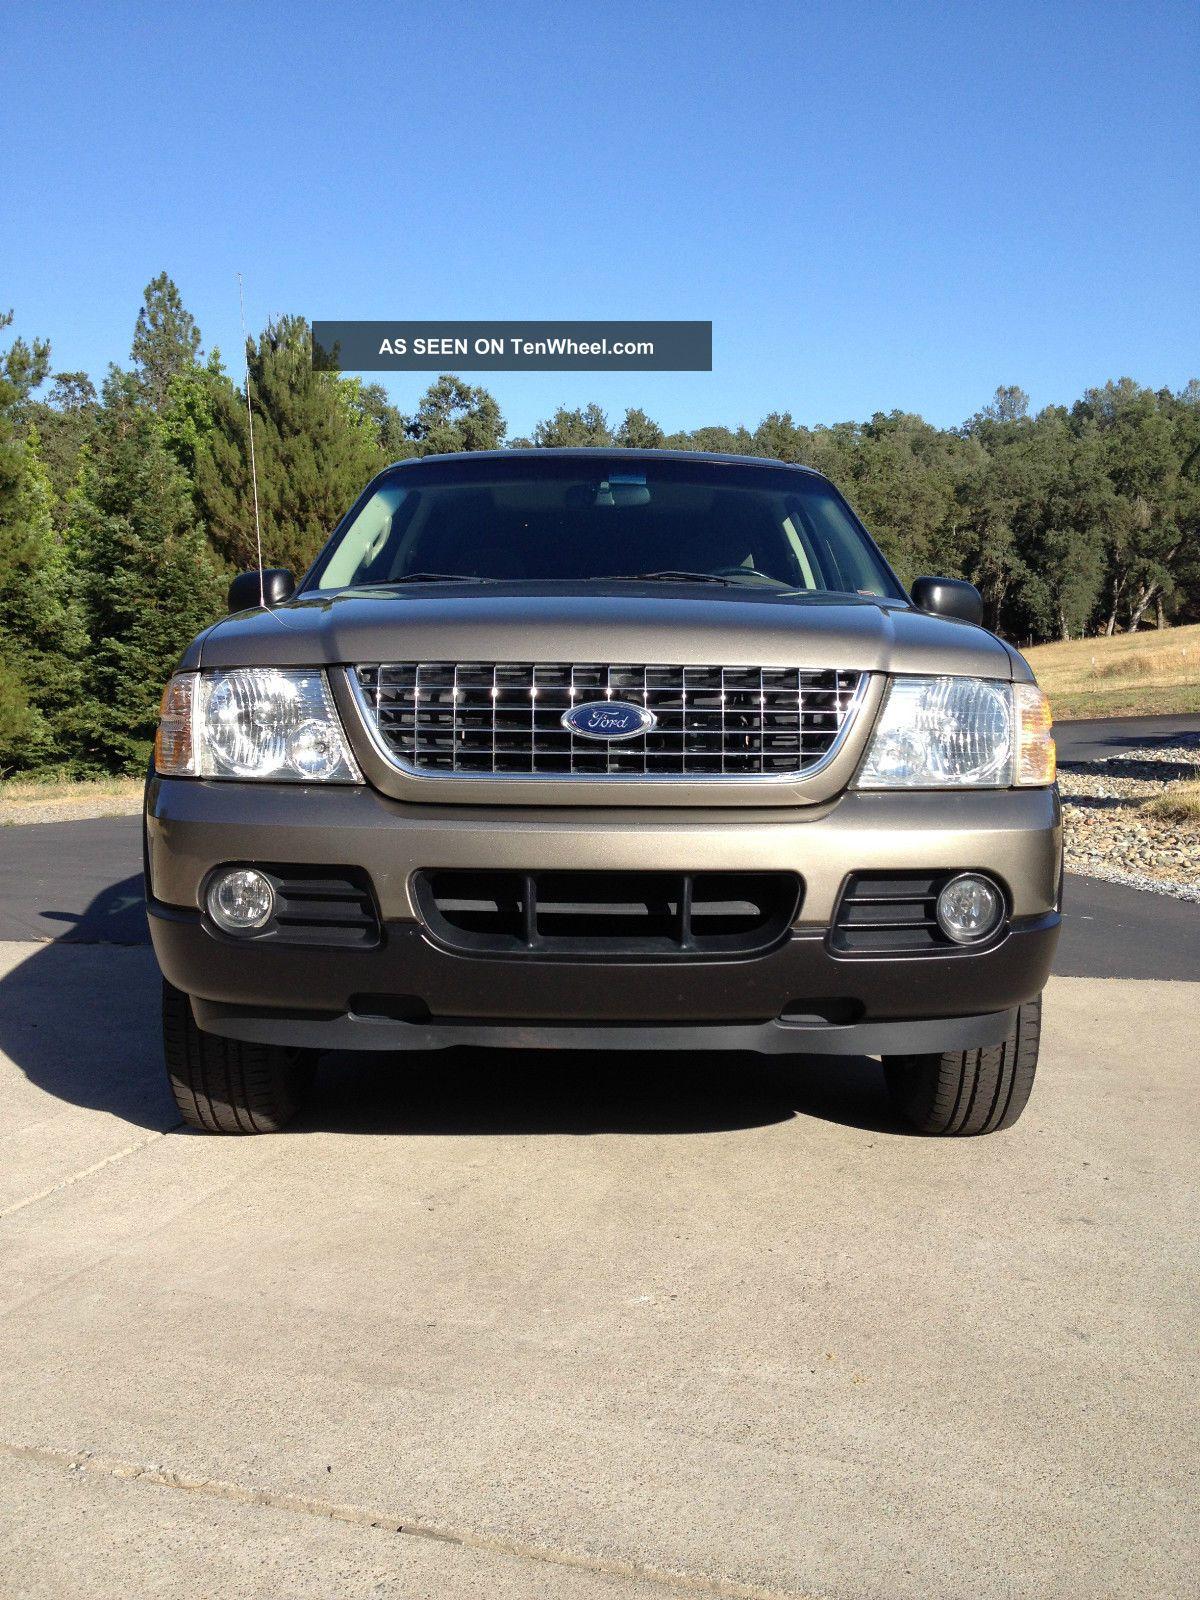 Ford Explorer 4x4 Suv Four Wheel Drive Cruise Control Autocheck